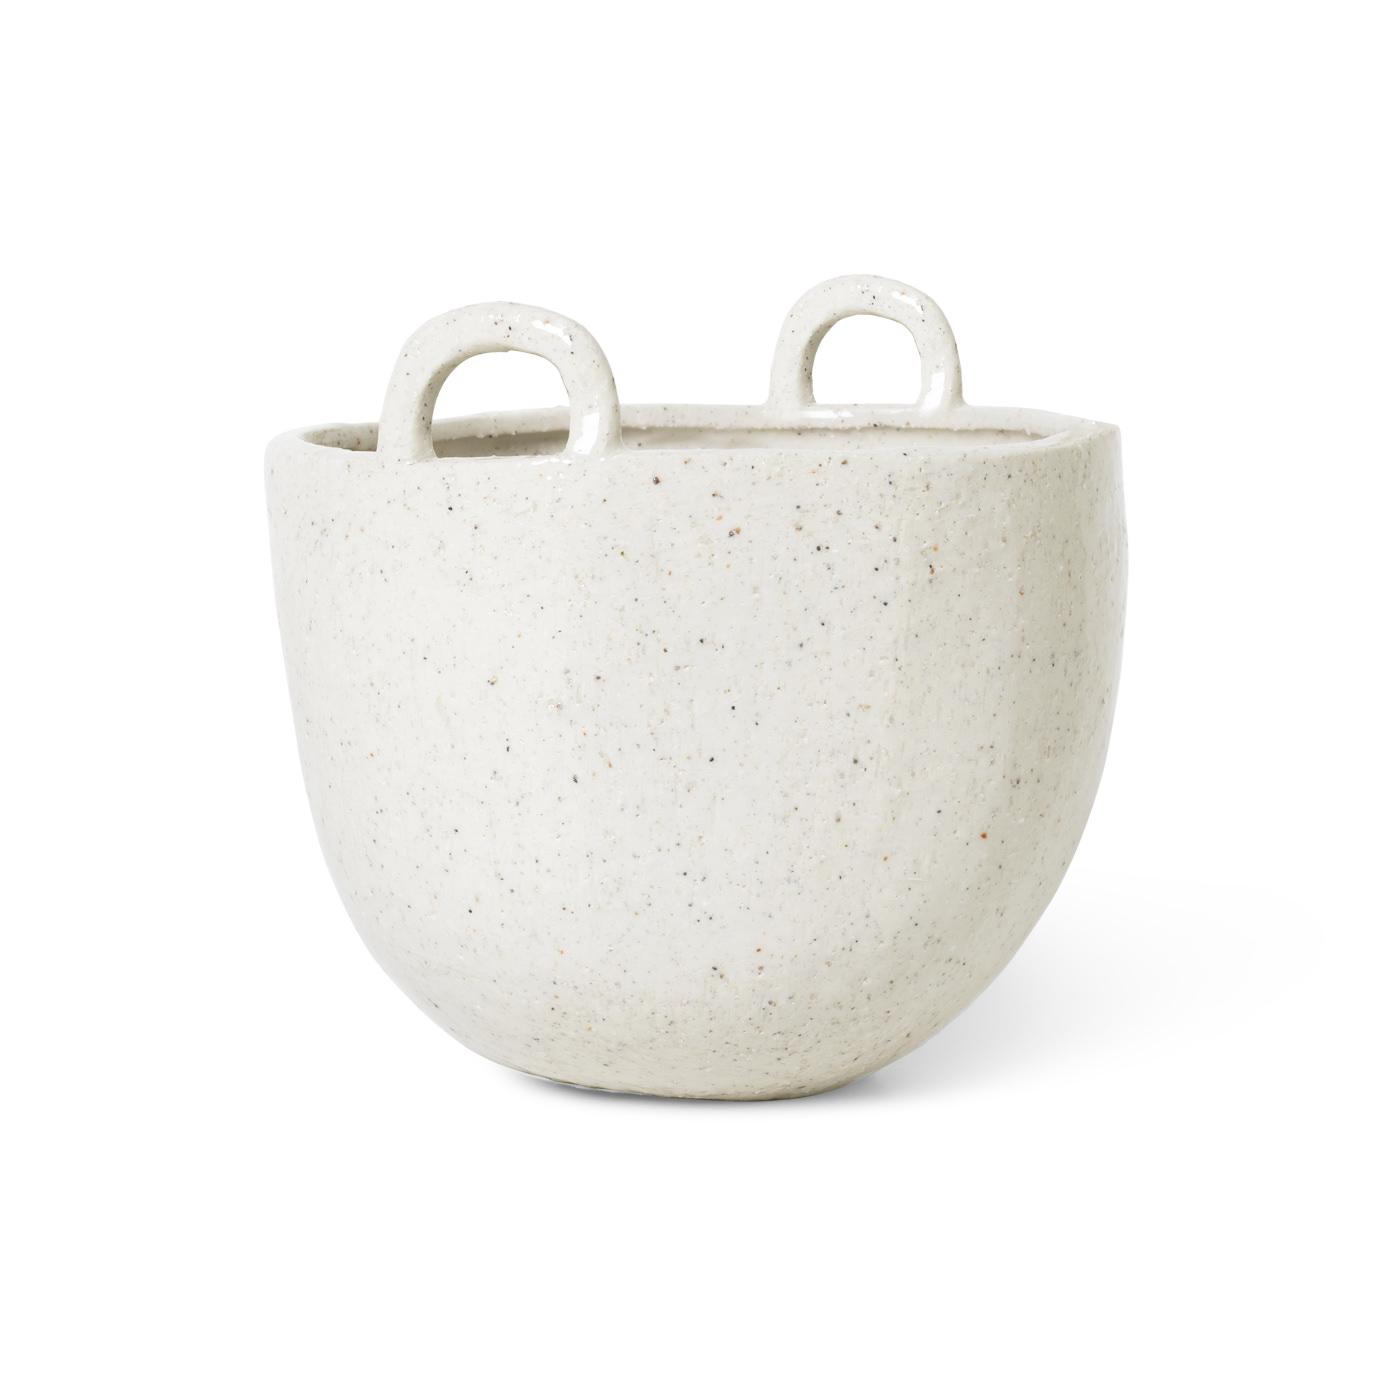 Ferm Living Collection AW19 Céramique